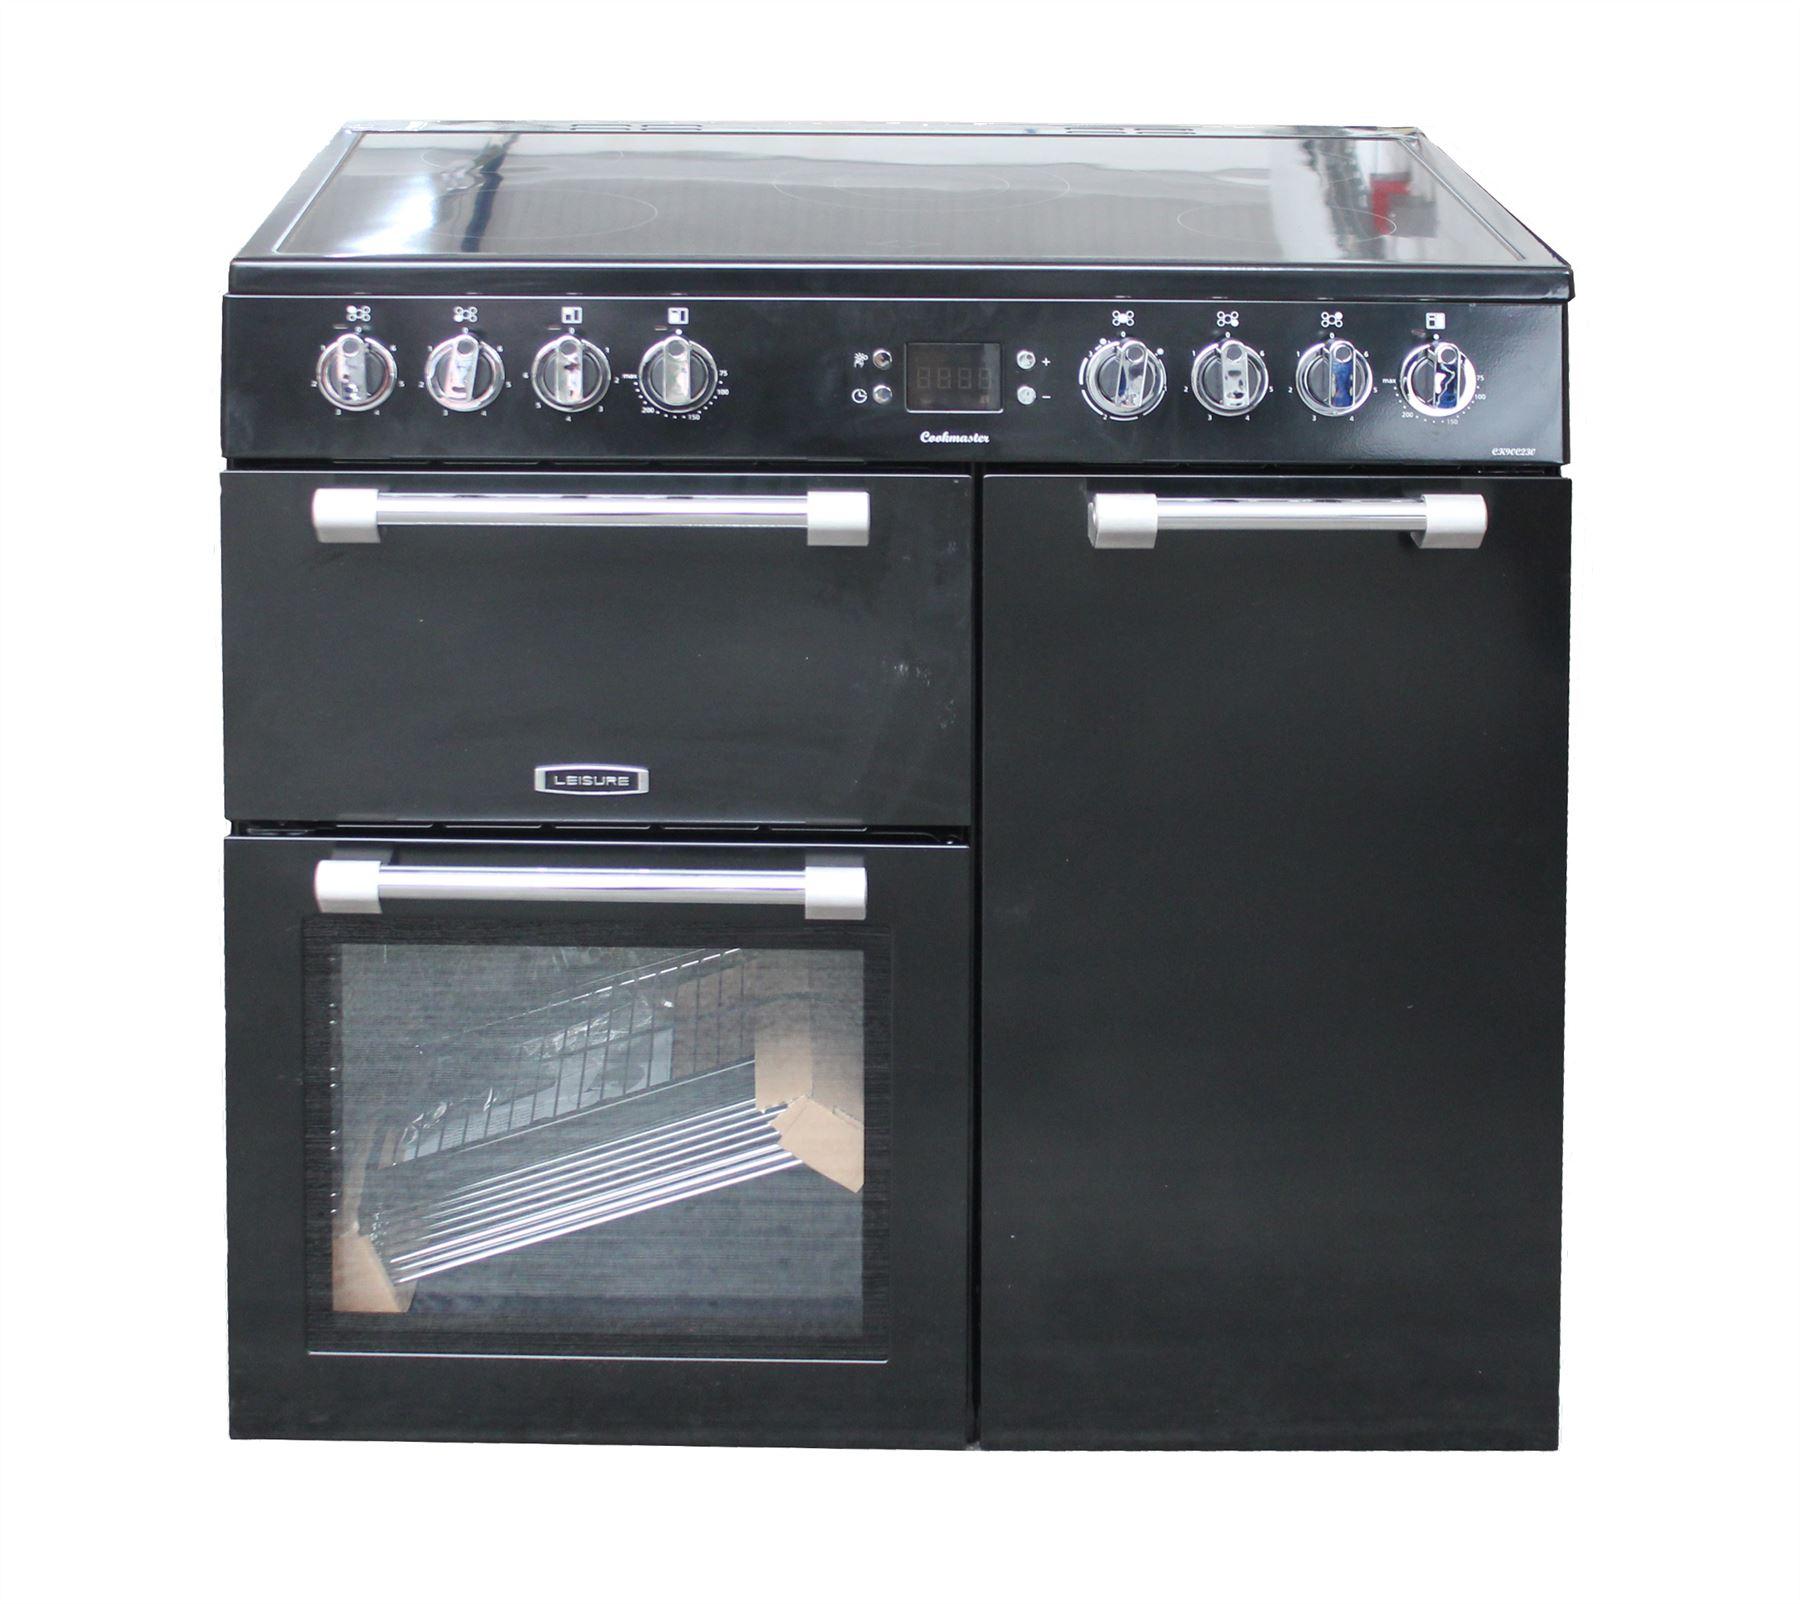 Leisure 90cm Electric Range Cooker Ck90c230k Double Oven